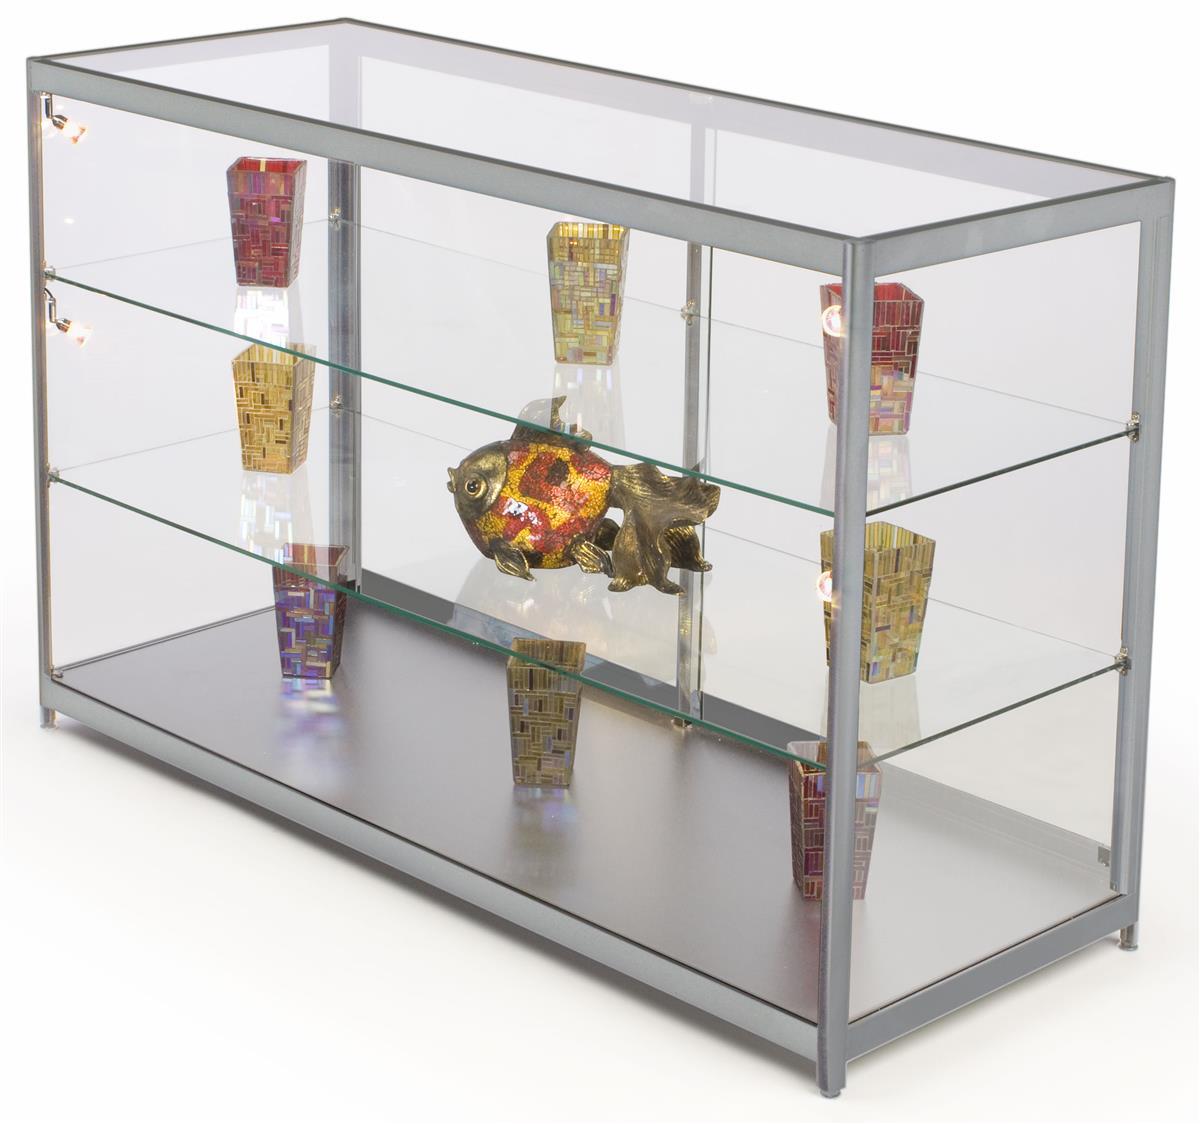 Tempered glass display counter silver finish interior for Case interior design